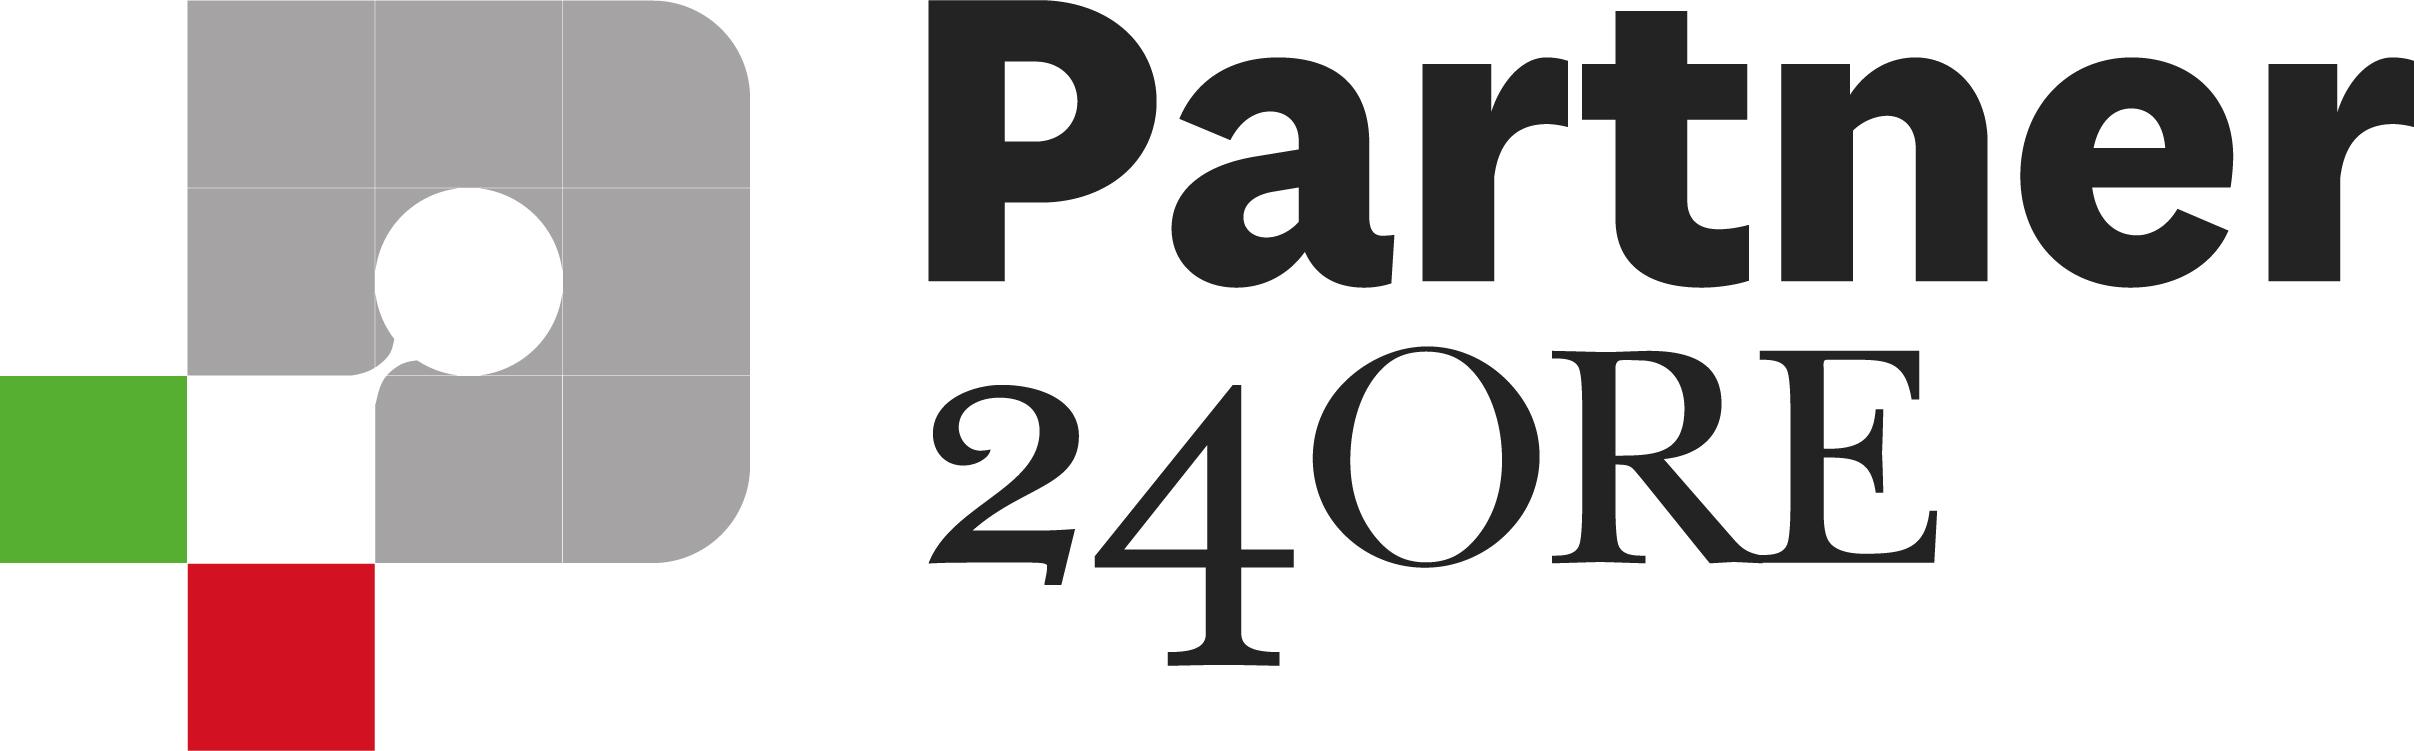 Partner 24 ore